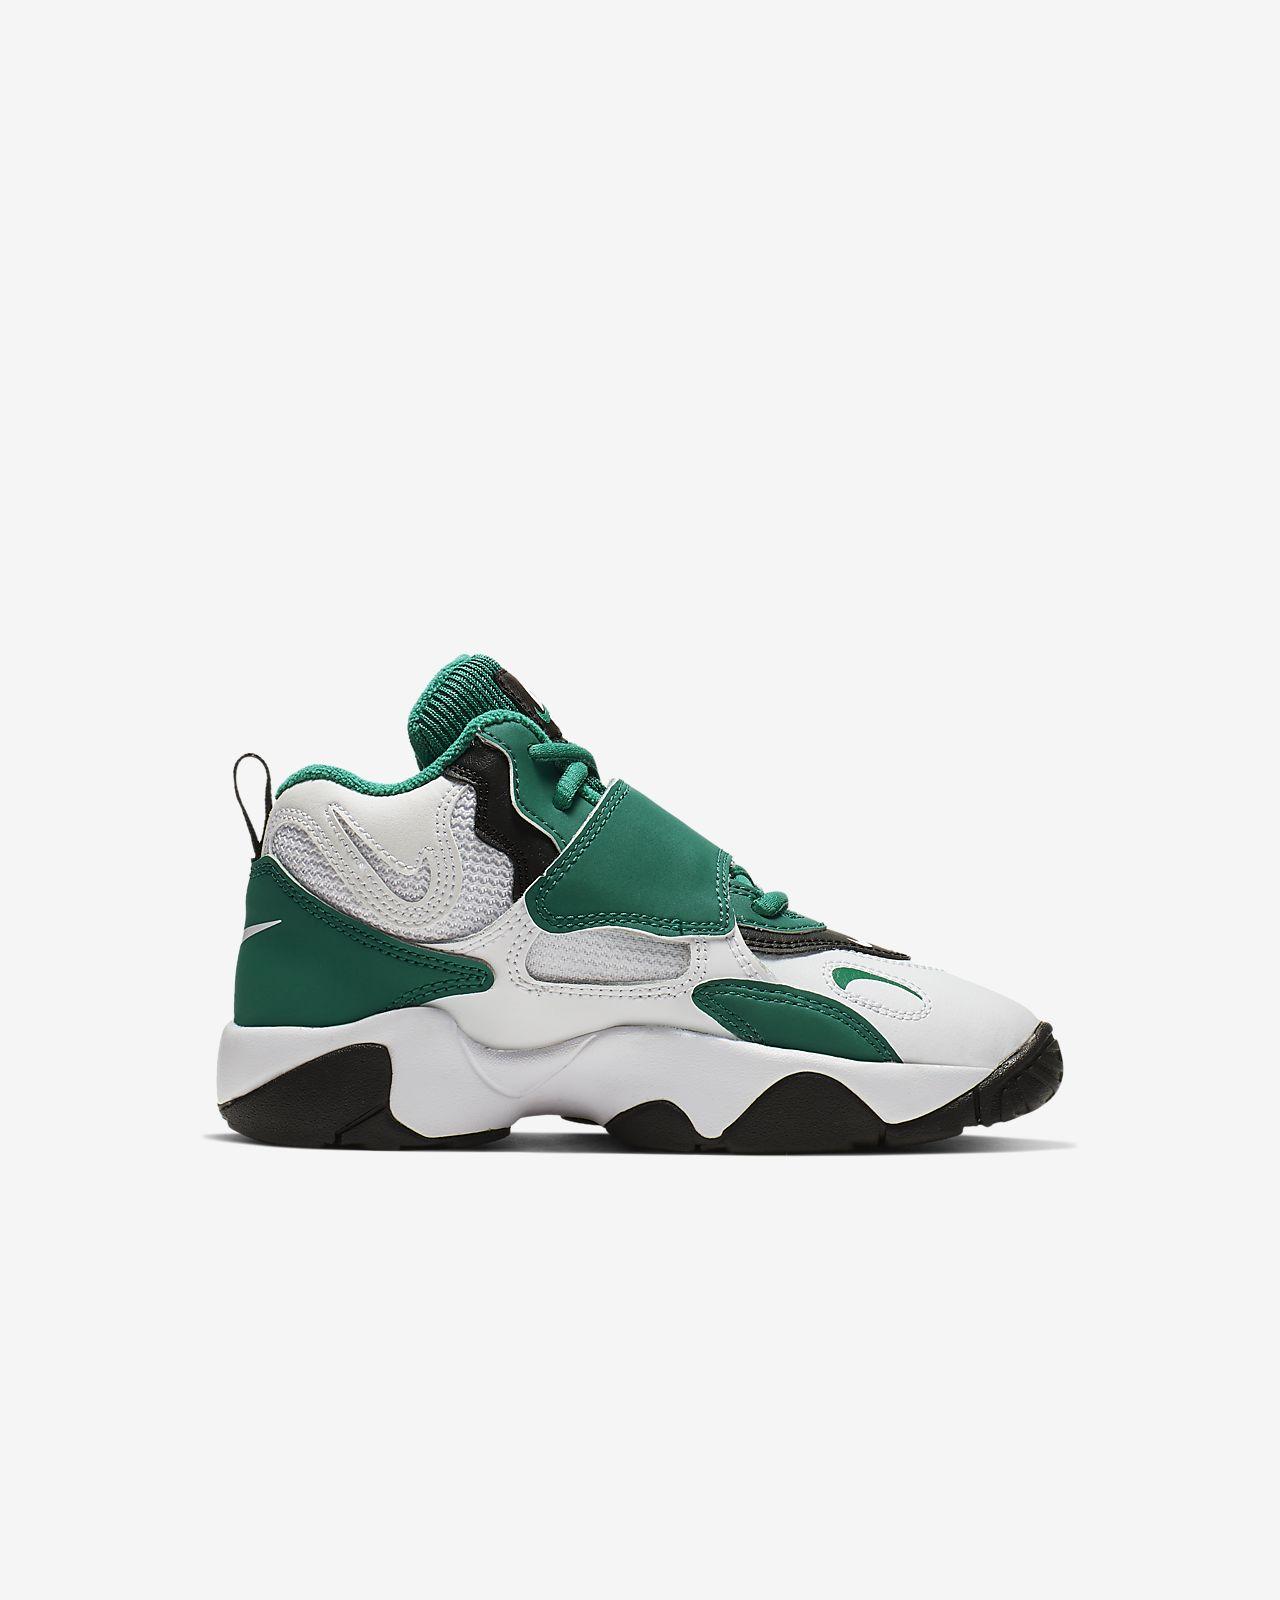 new concept 5597e 50ac9 ... Nike Speed Turf Little Kids  Shoe